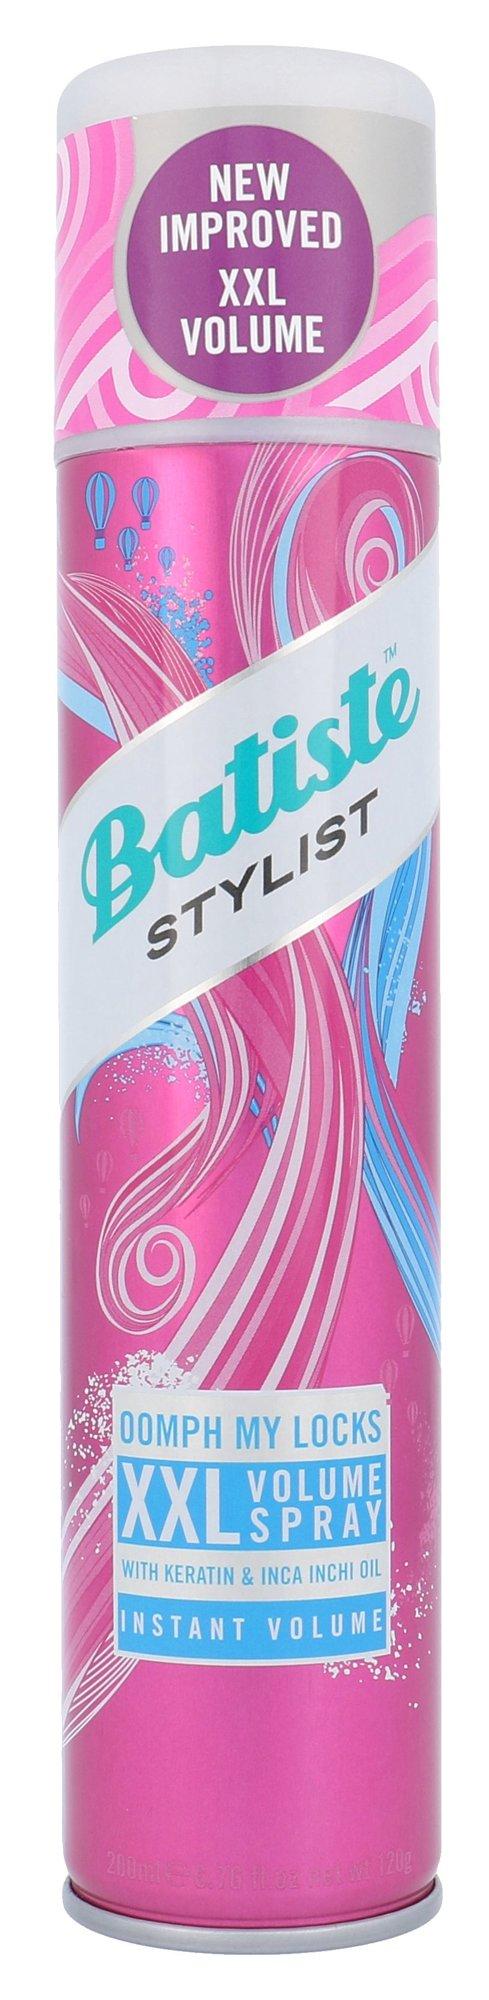 Batiste Stylist Cosmetic 200ml